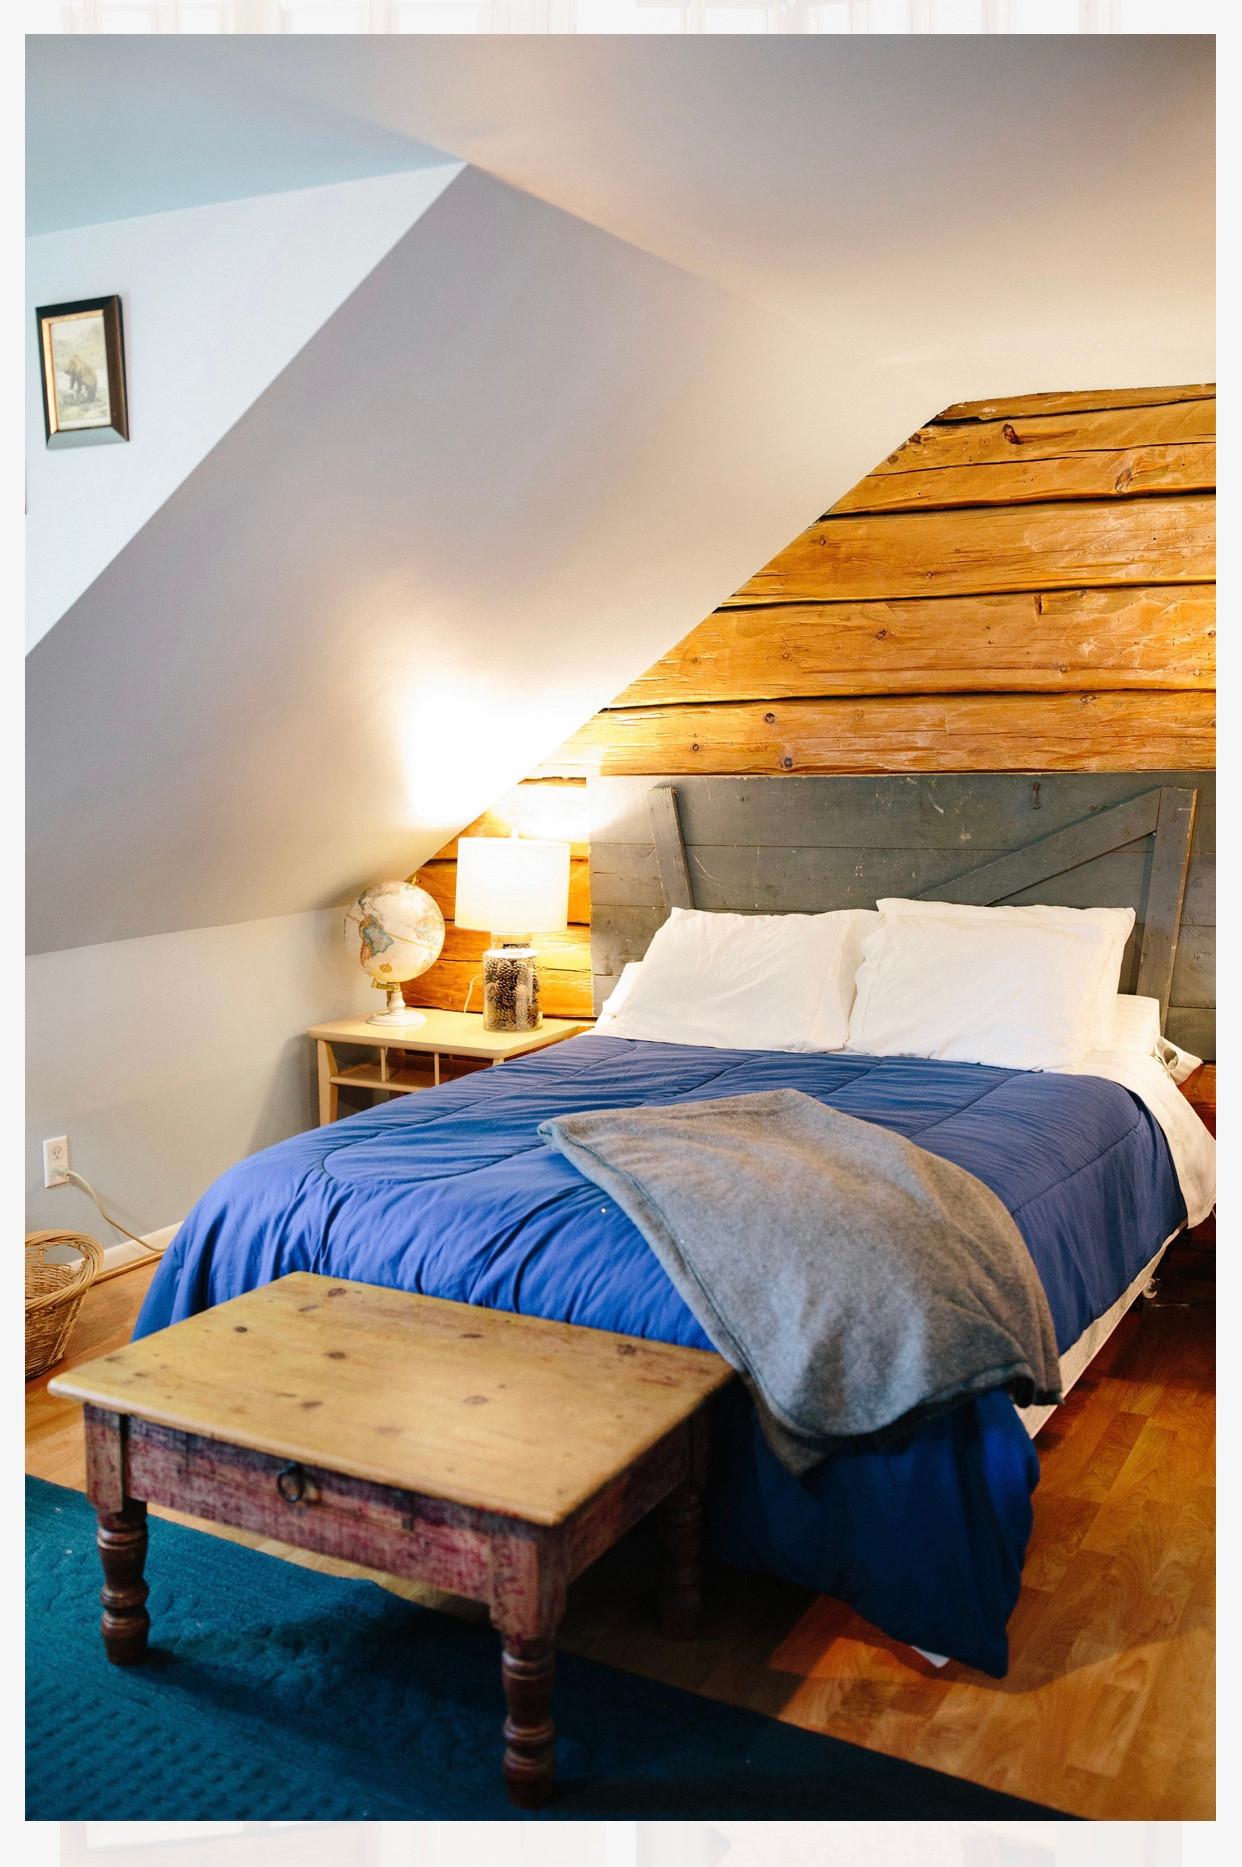 $1,100 Shared Room